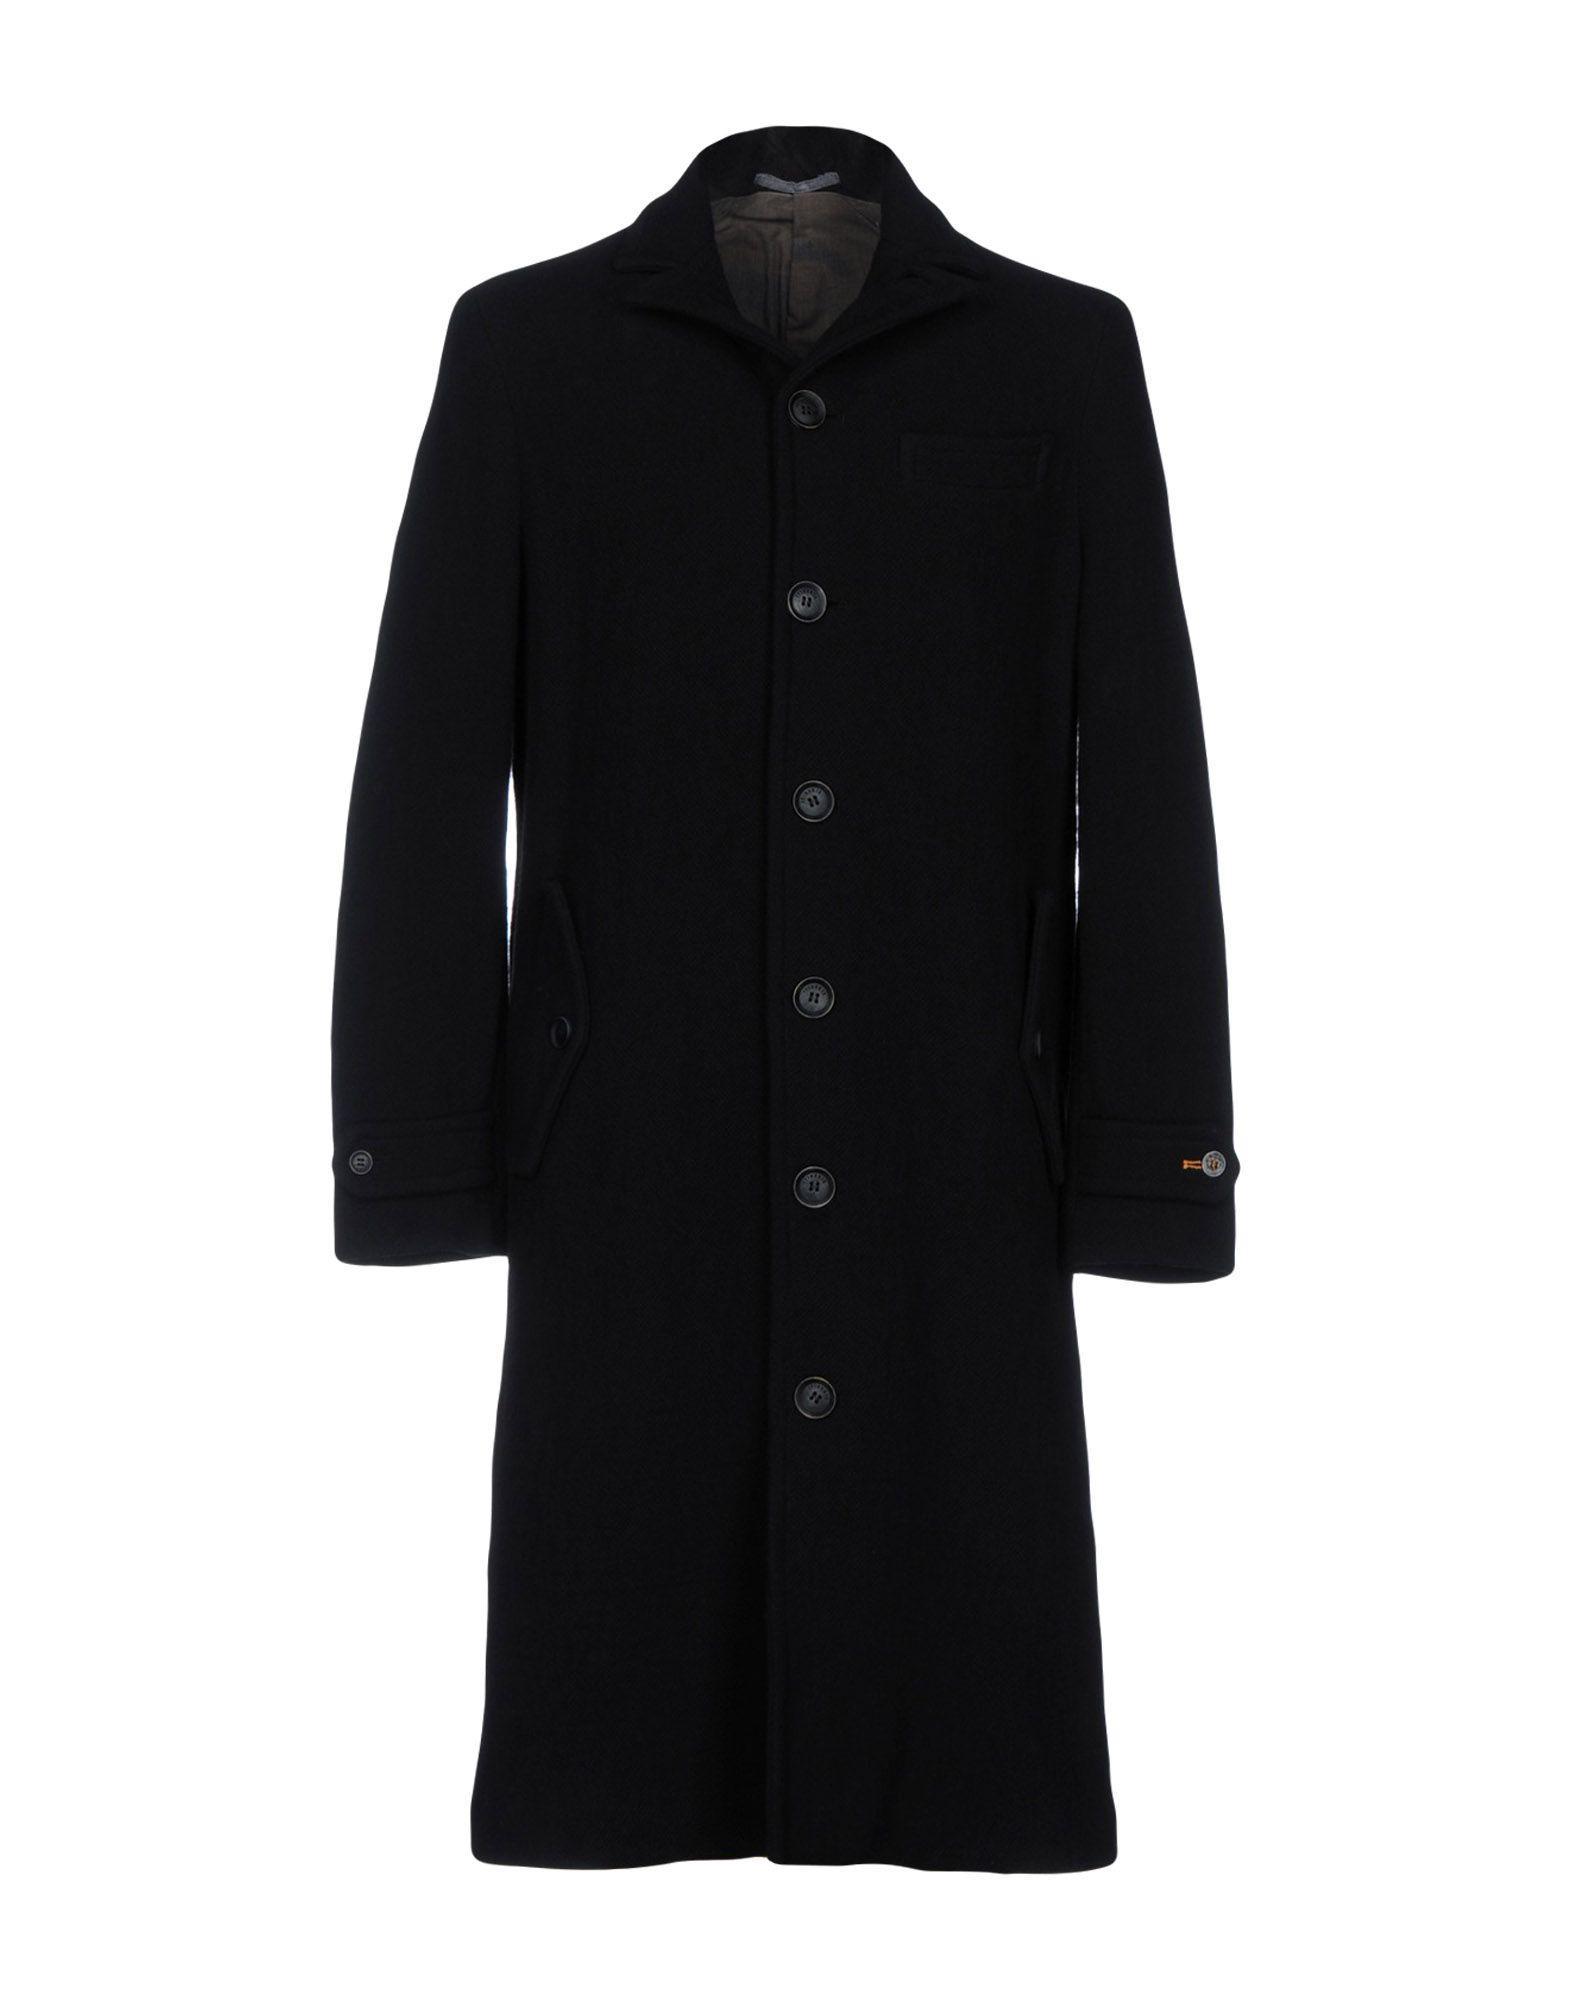 Itineris Coats In Black